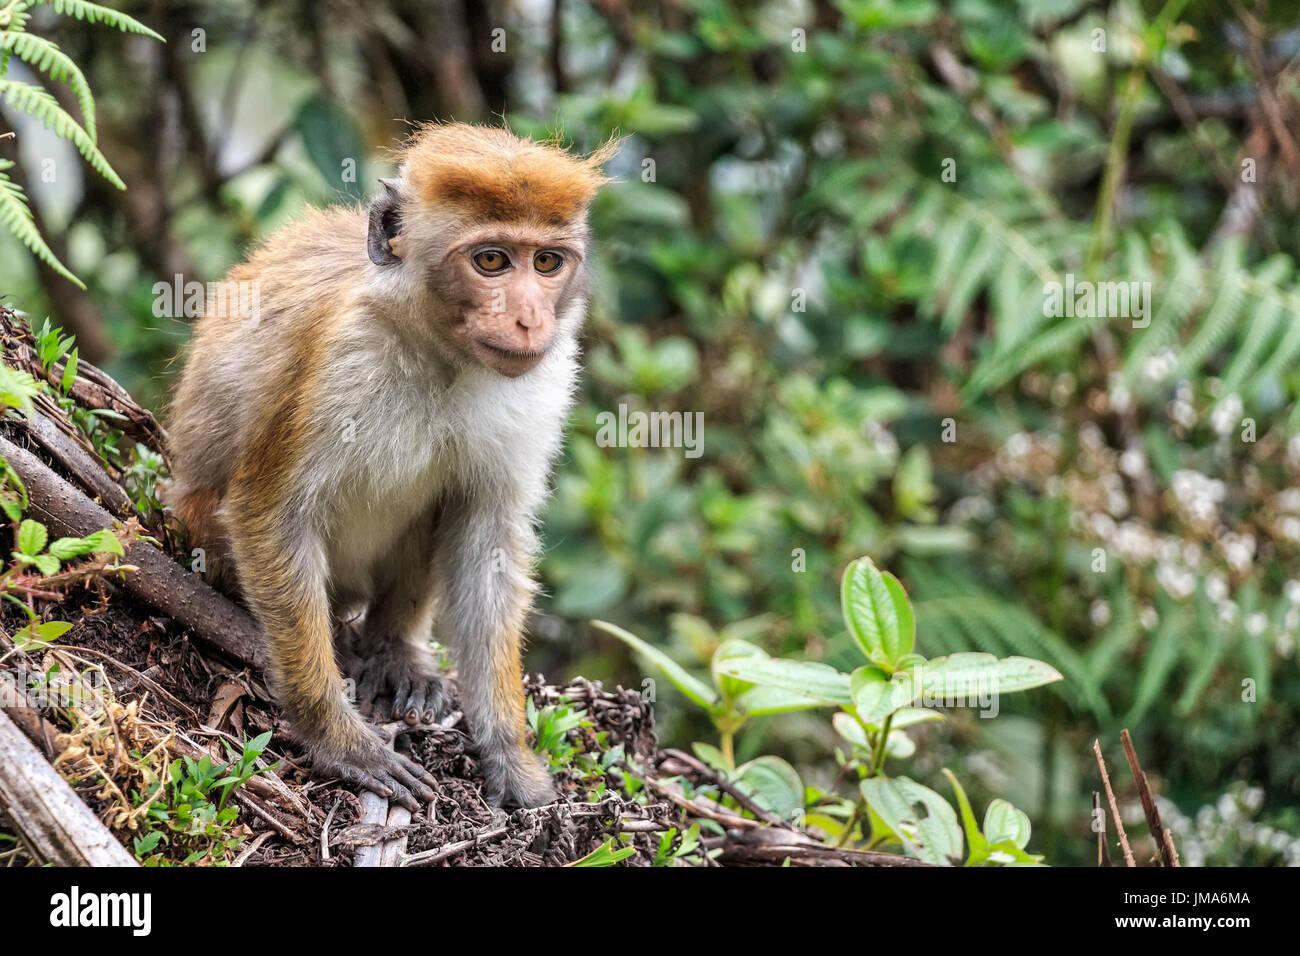 Photograph of Sri-Lankan toque macaque or Macaca sinica - Stock Image